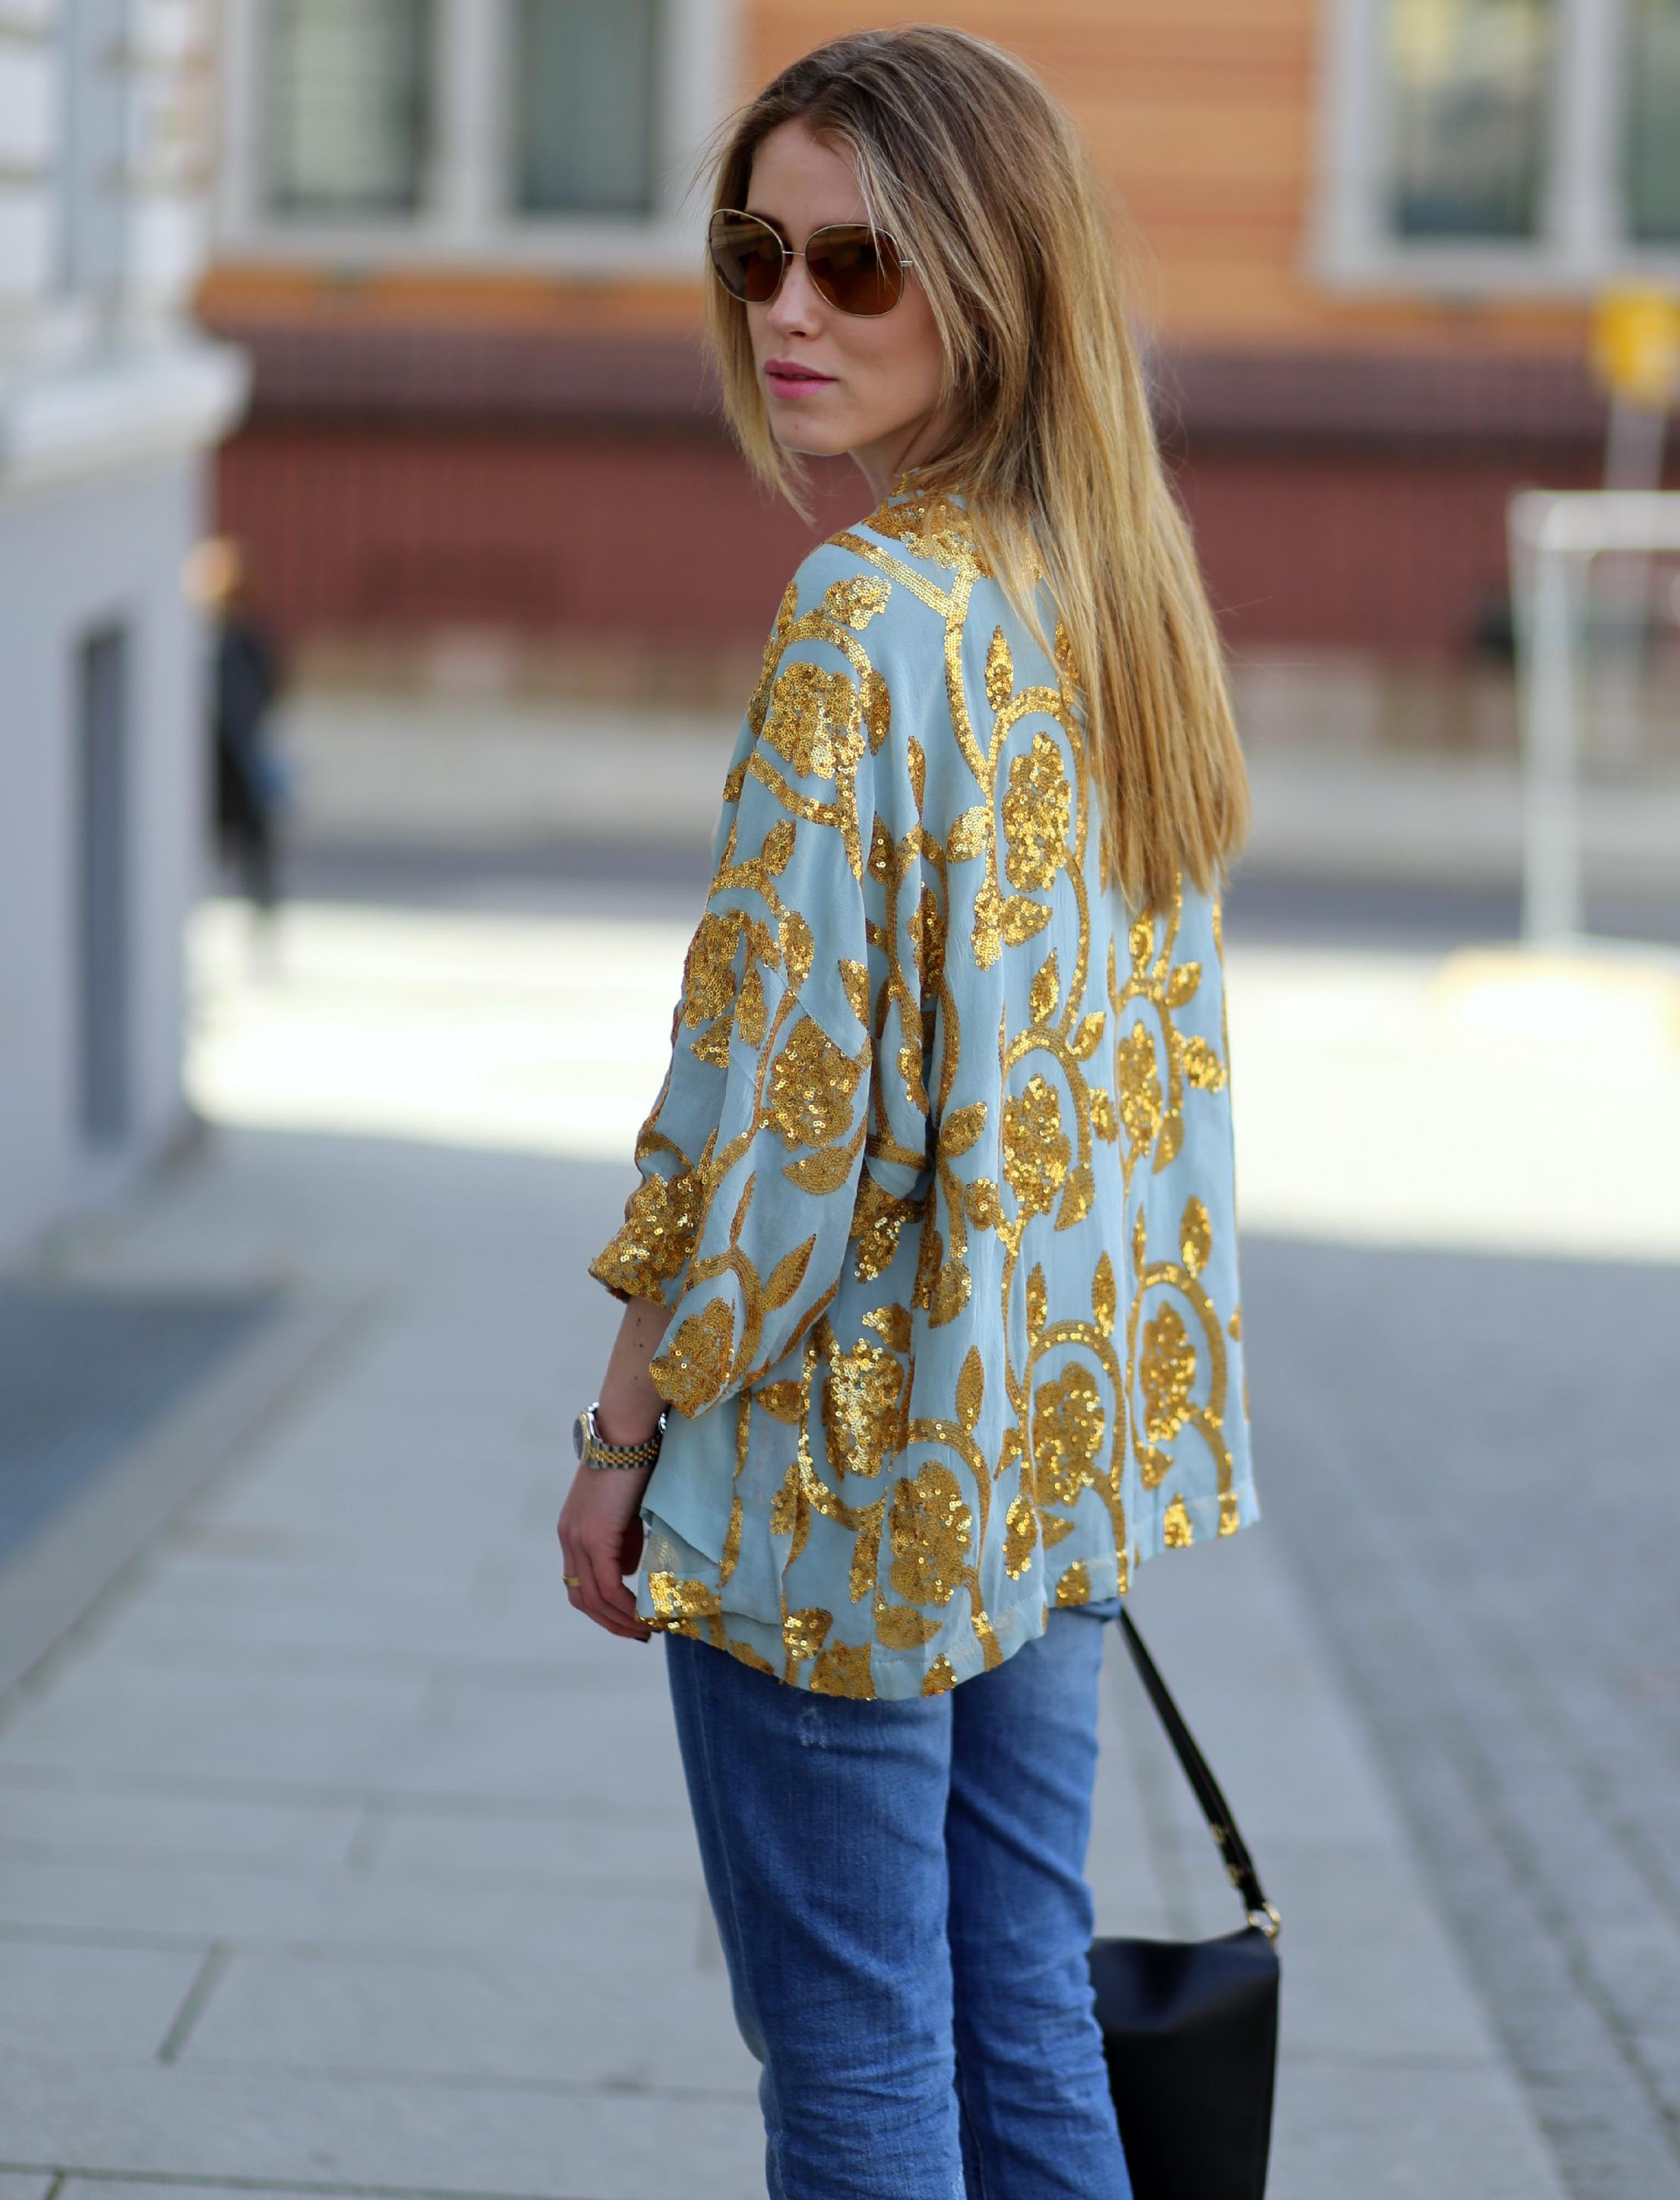 cum sa port kimonoul